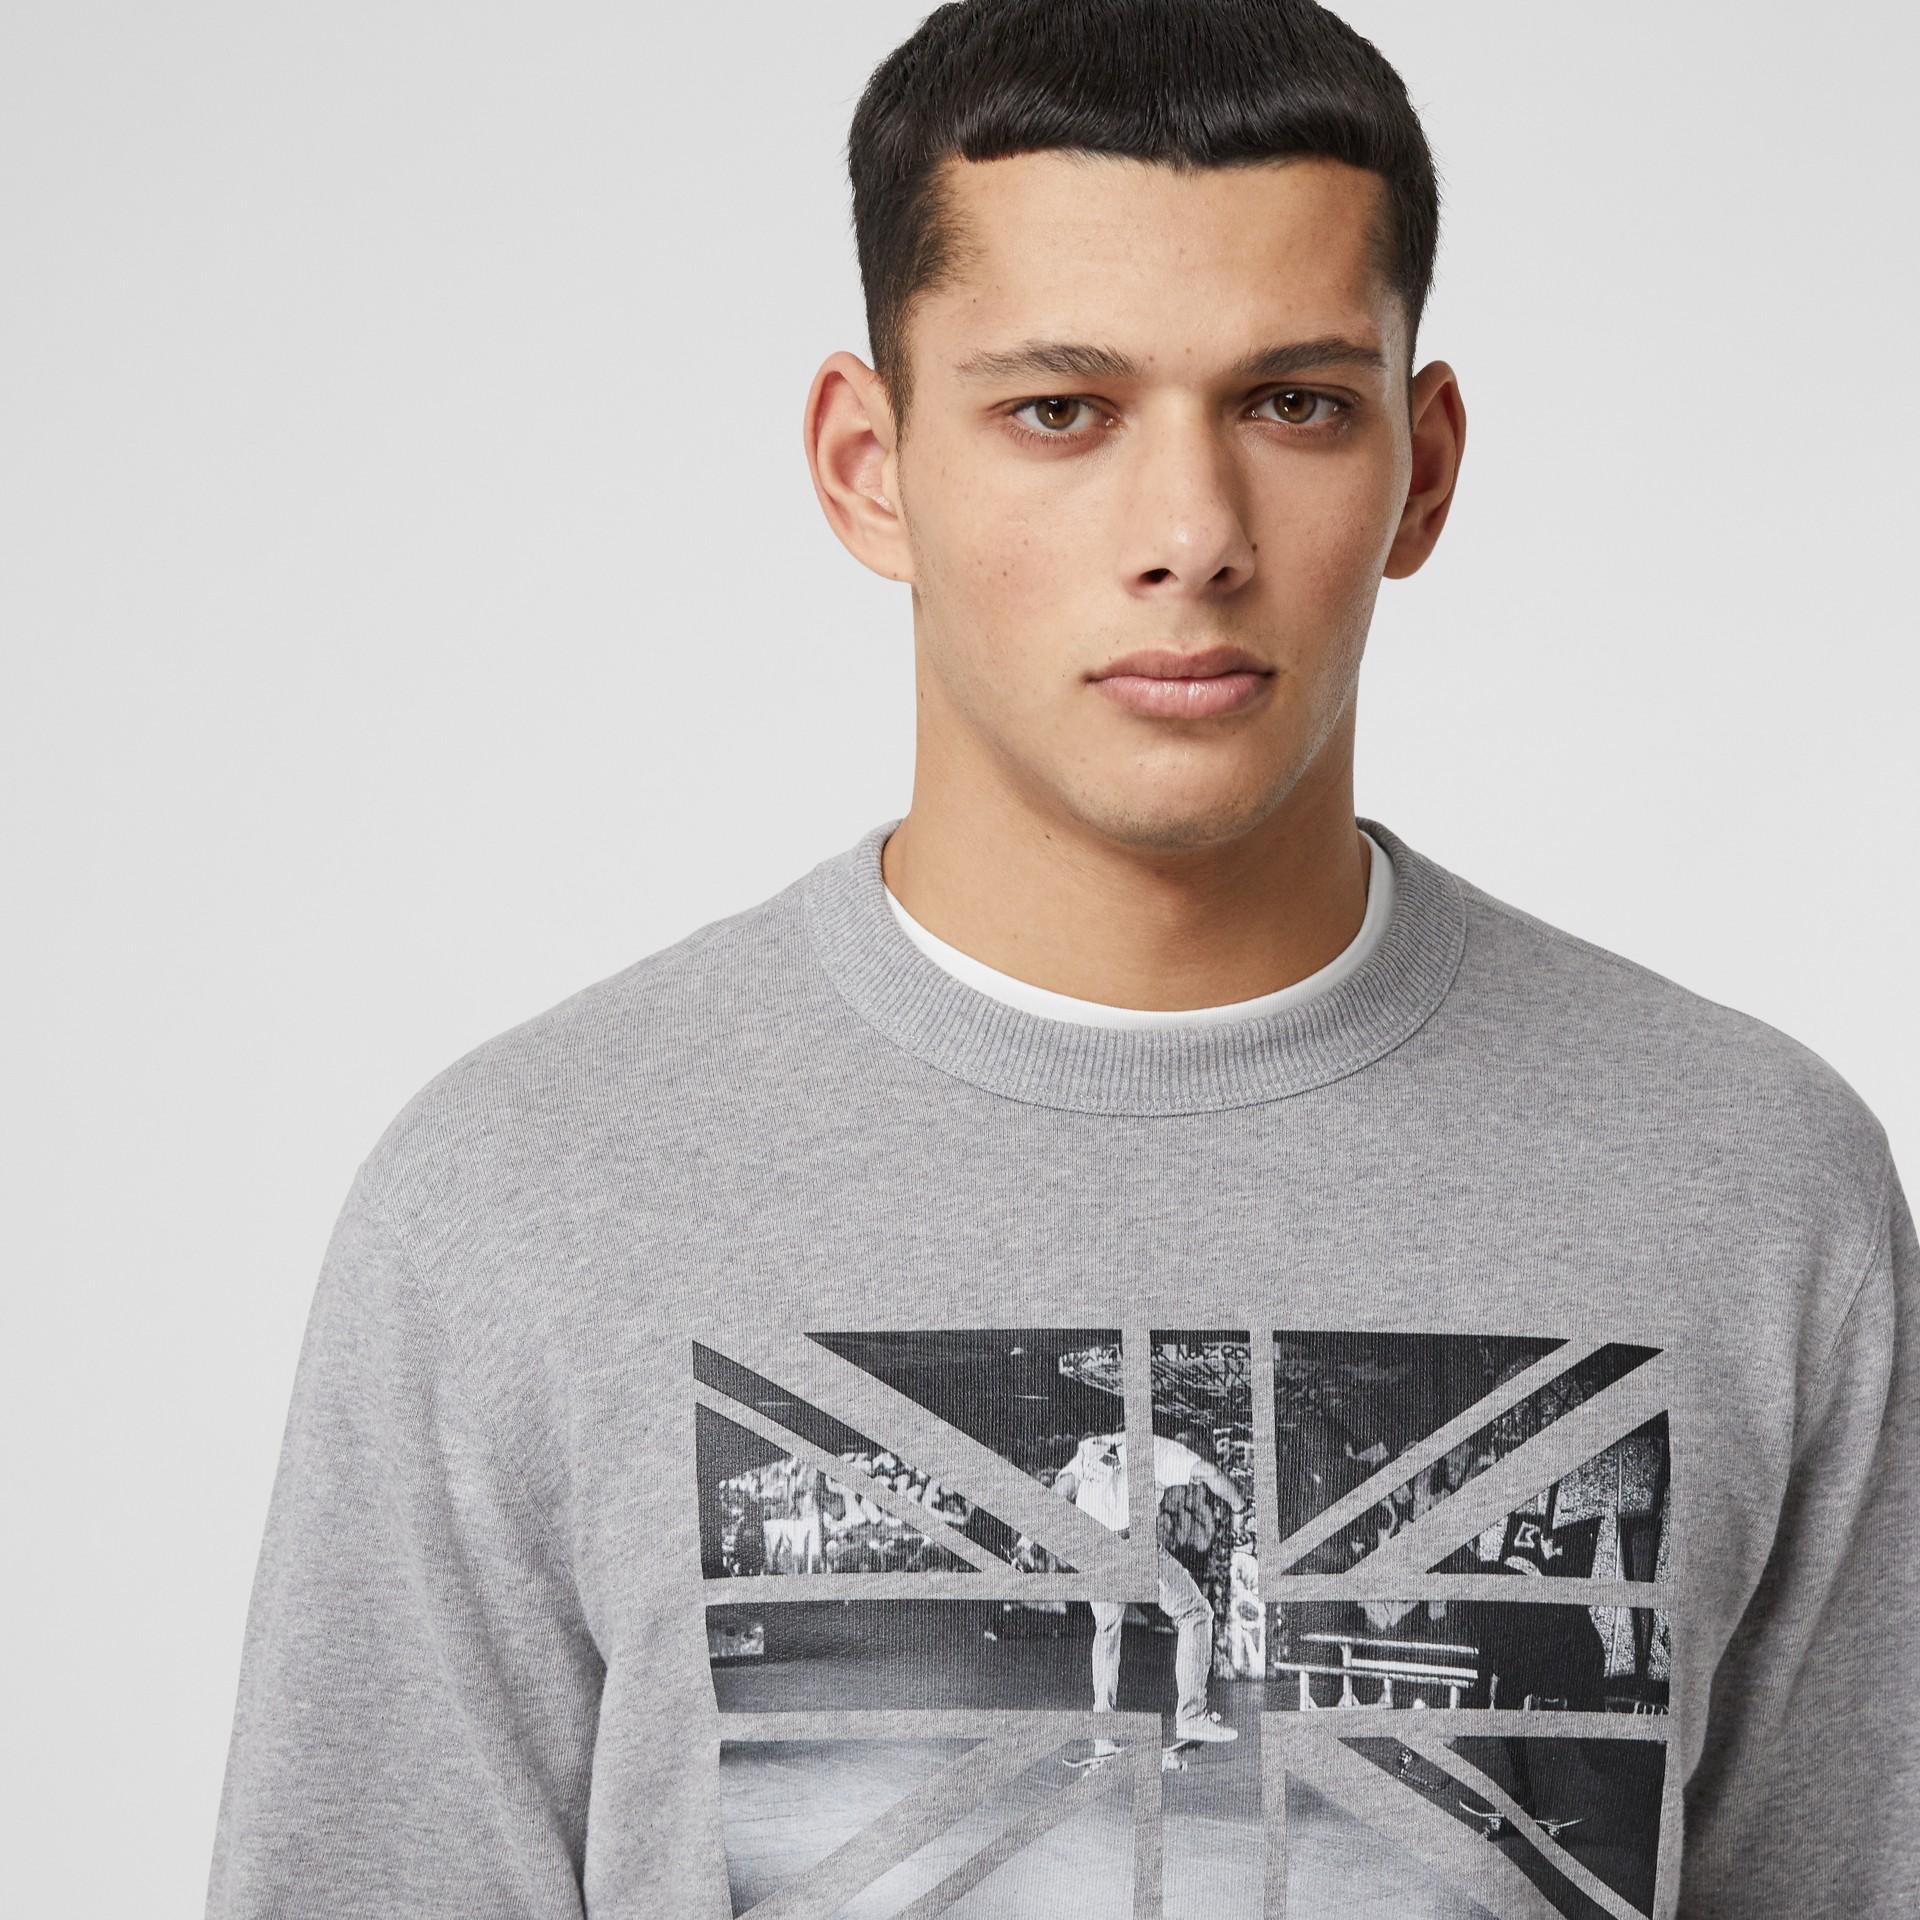 Union Jack Photo Print Cotton Sweatshirt in Pale Grey Melange - Men | Burberry - gallery image 1